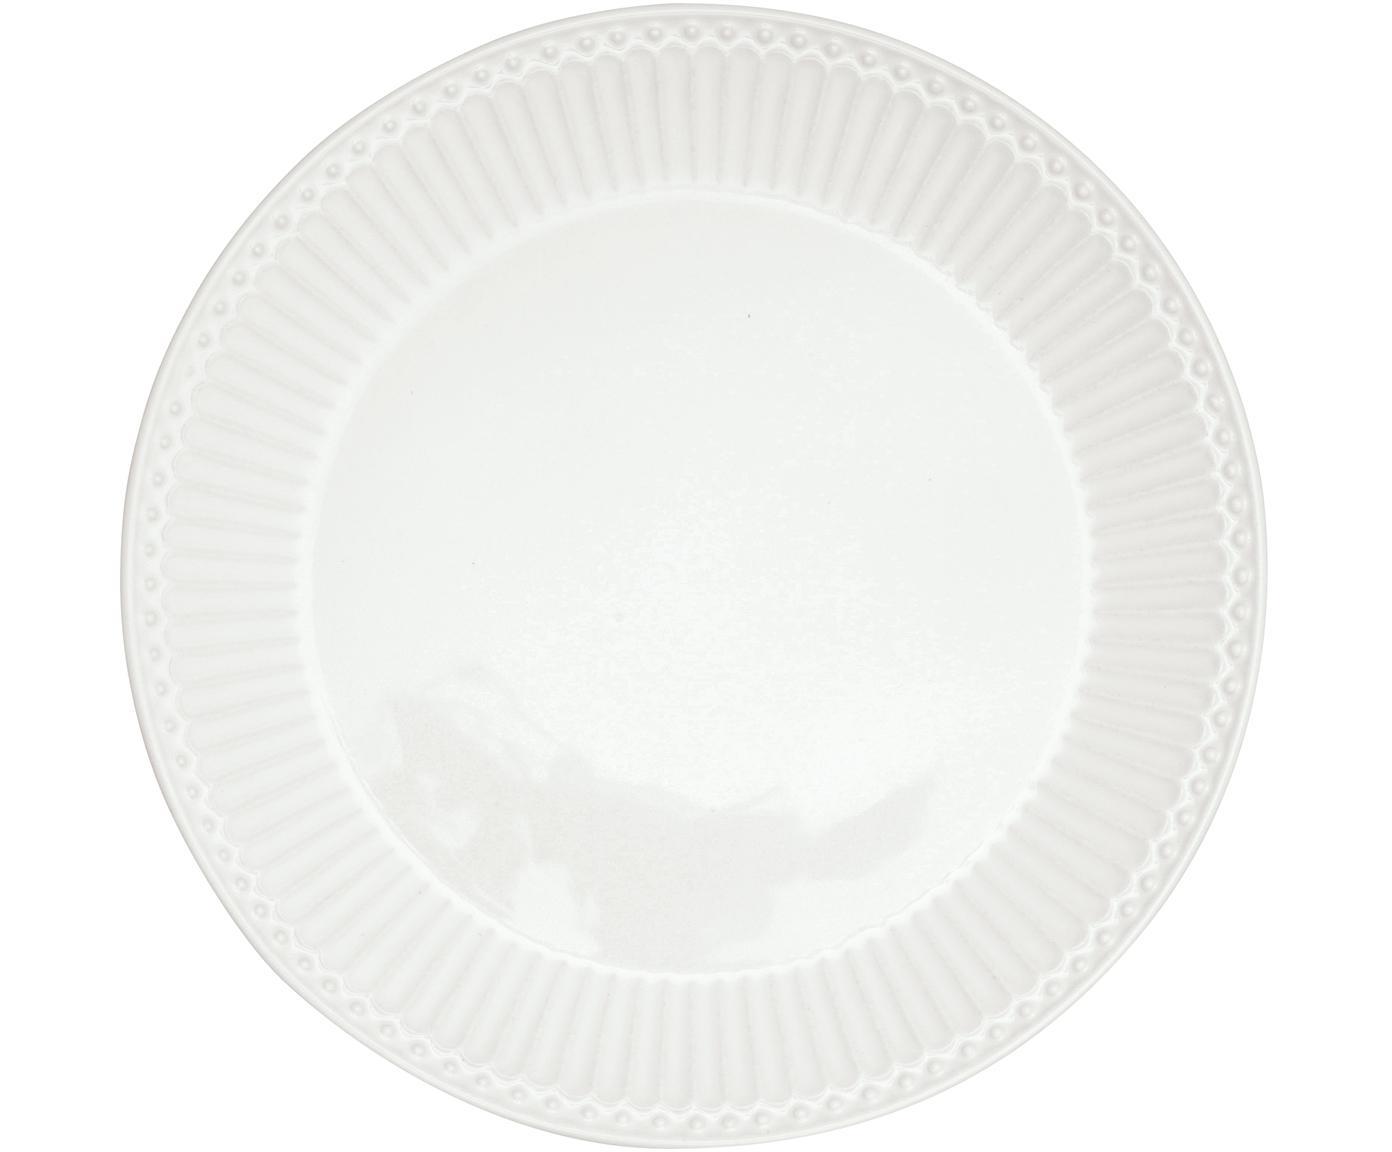 Platos postre Alice, 2uds., Porcelana, Blanco, Ø 23 cm